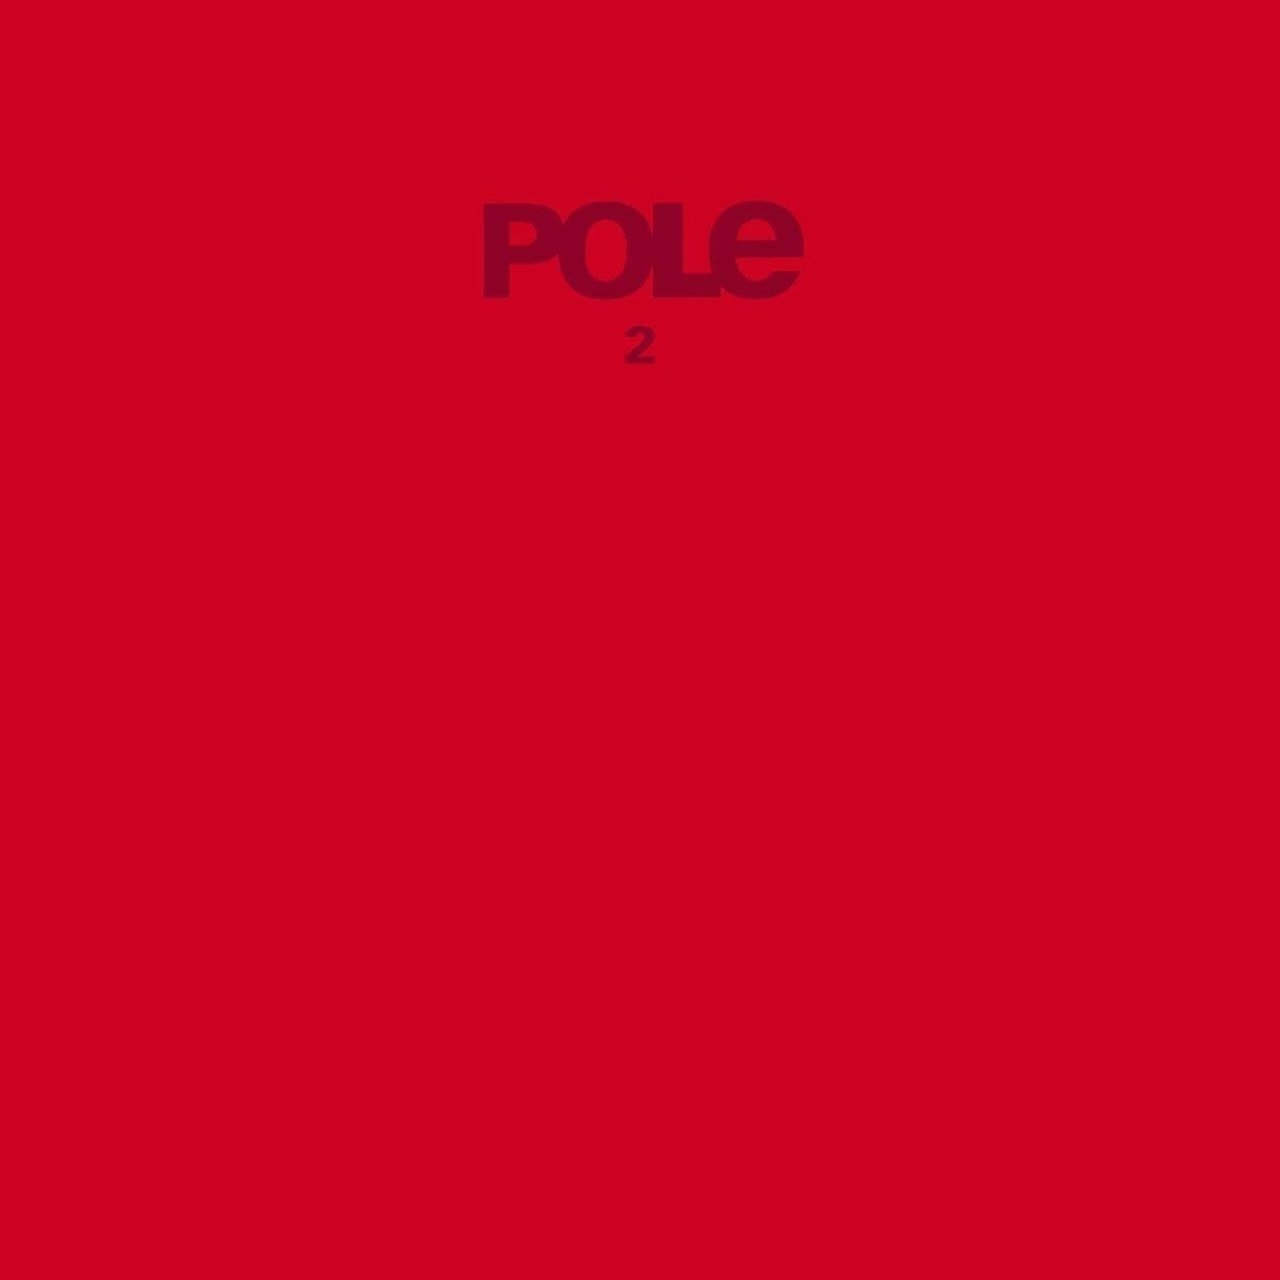 POLE2 - 1